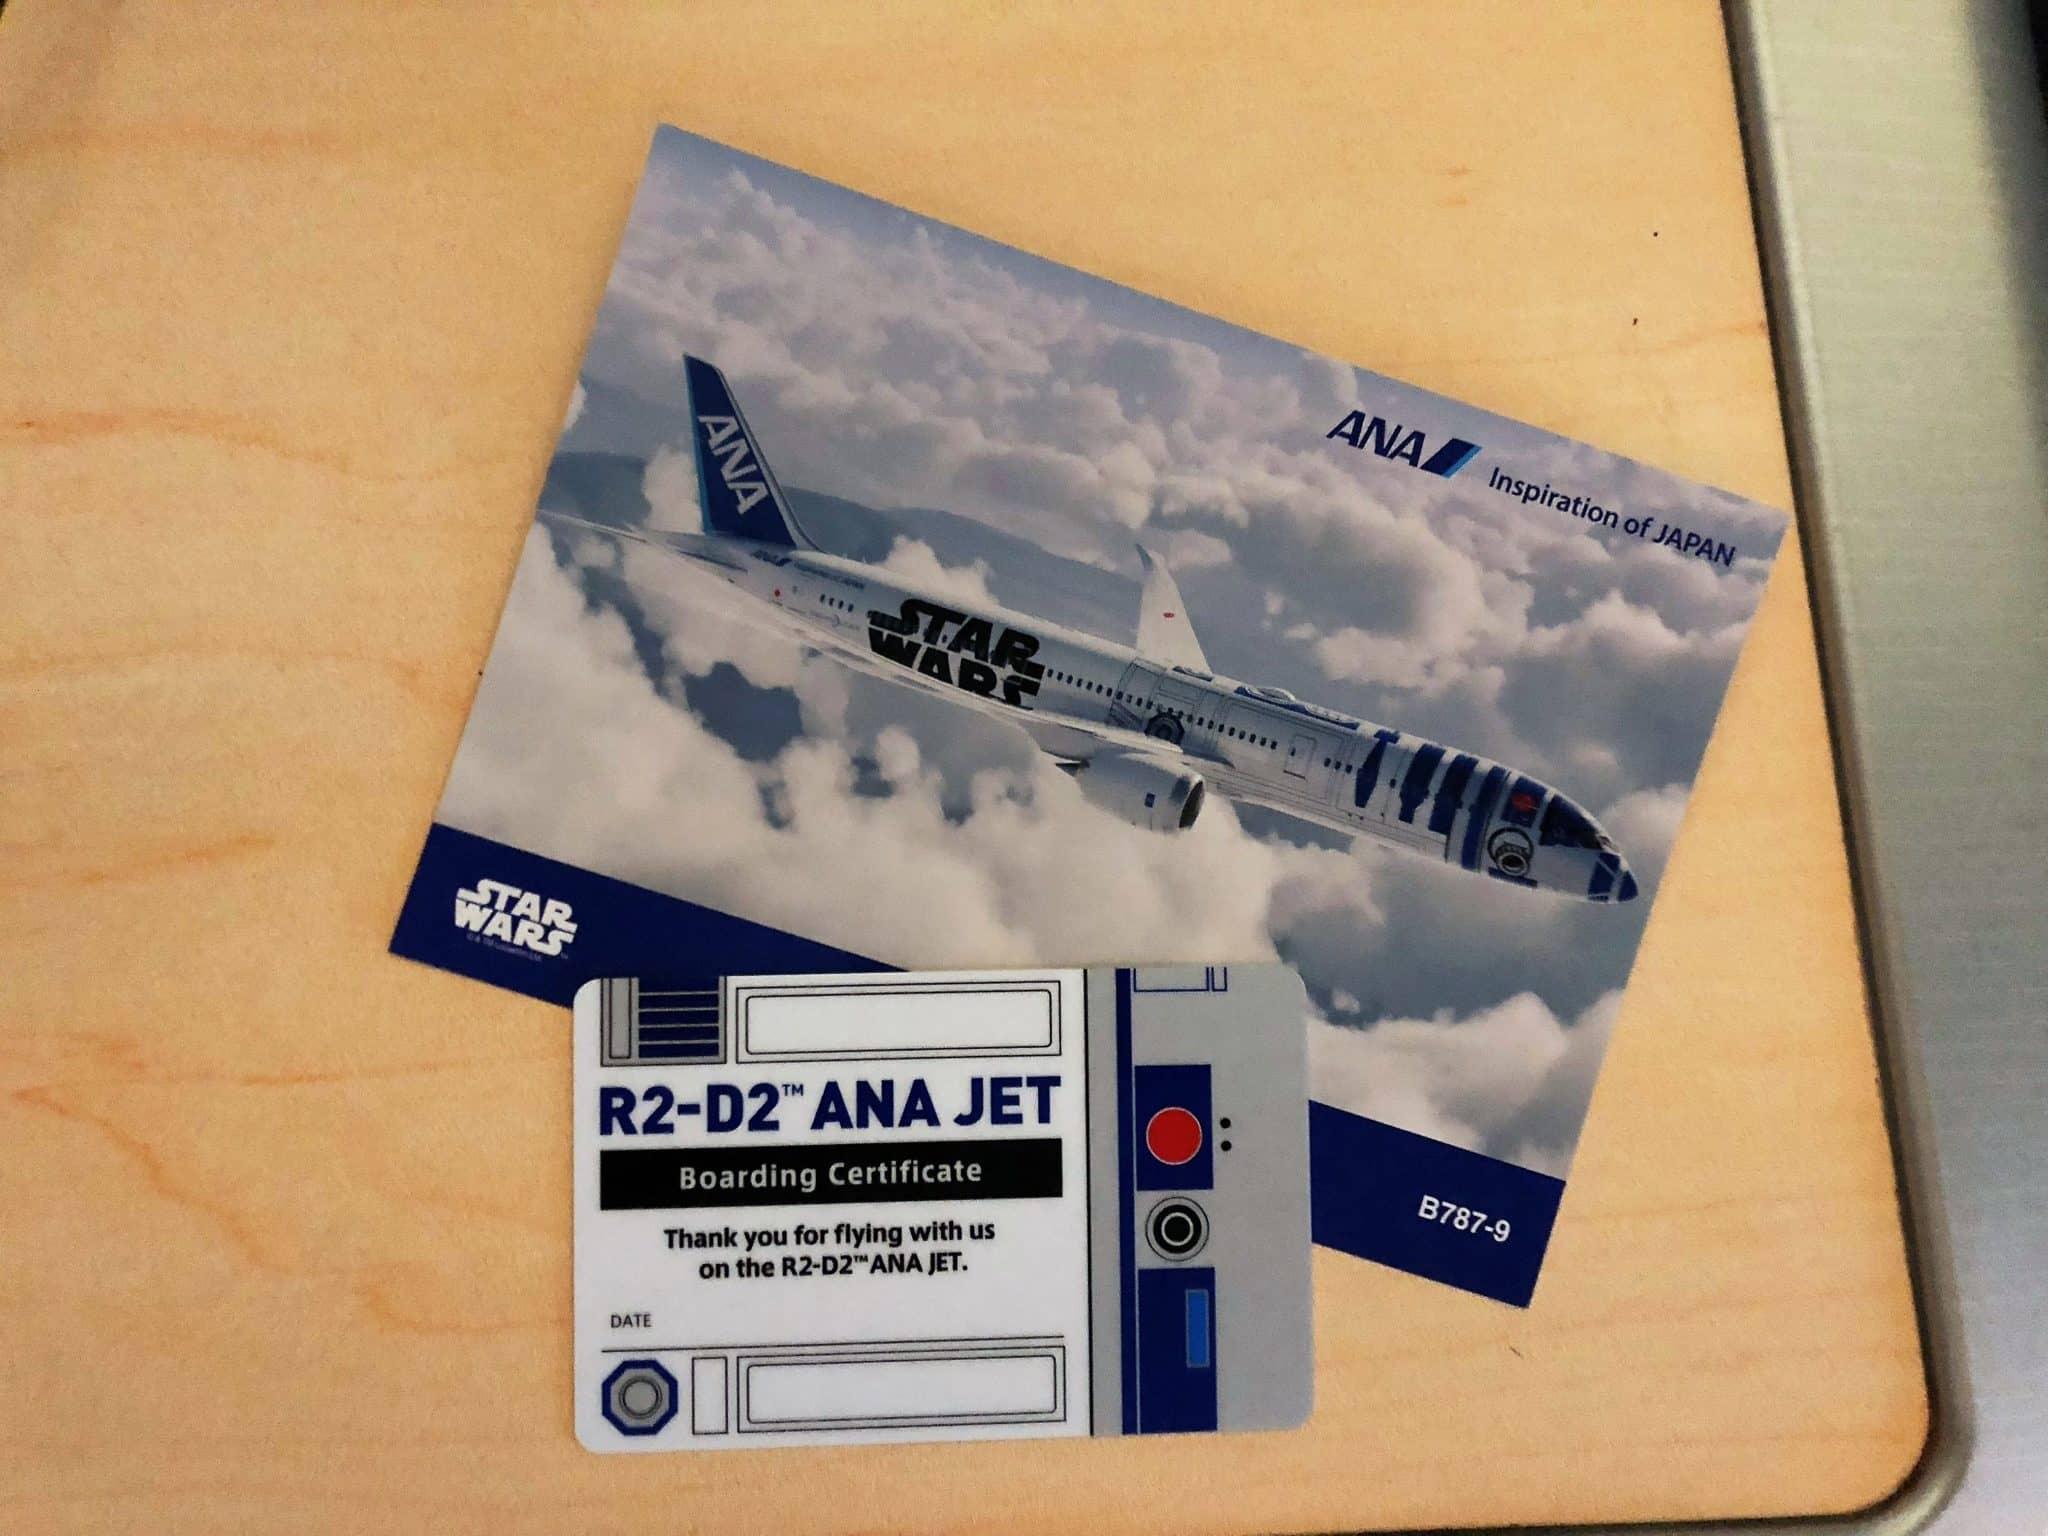 ANA Business Class B787-9 Boarding Zertifikat